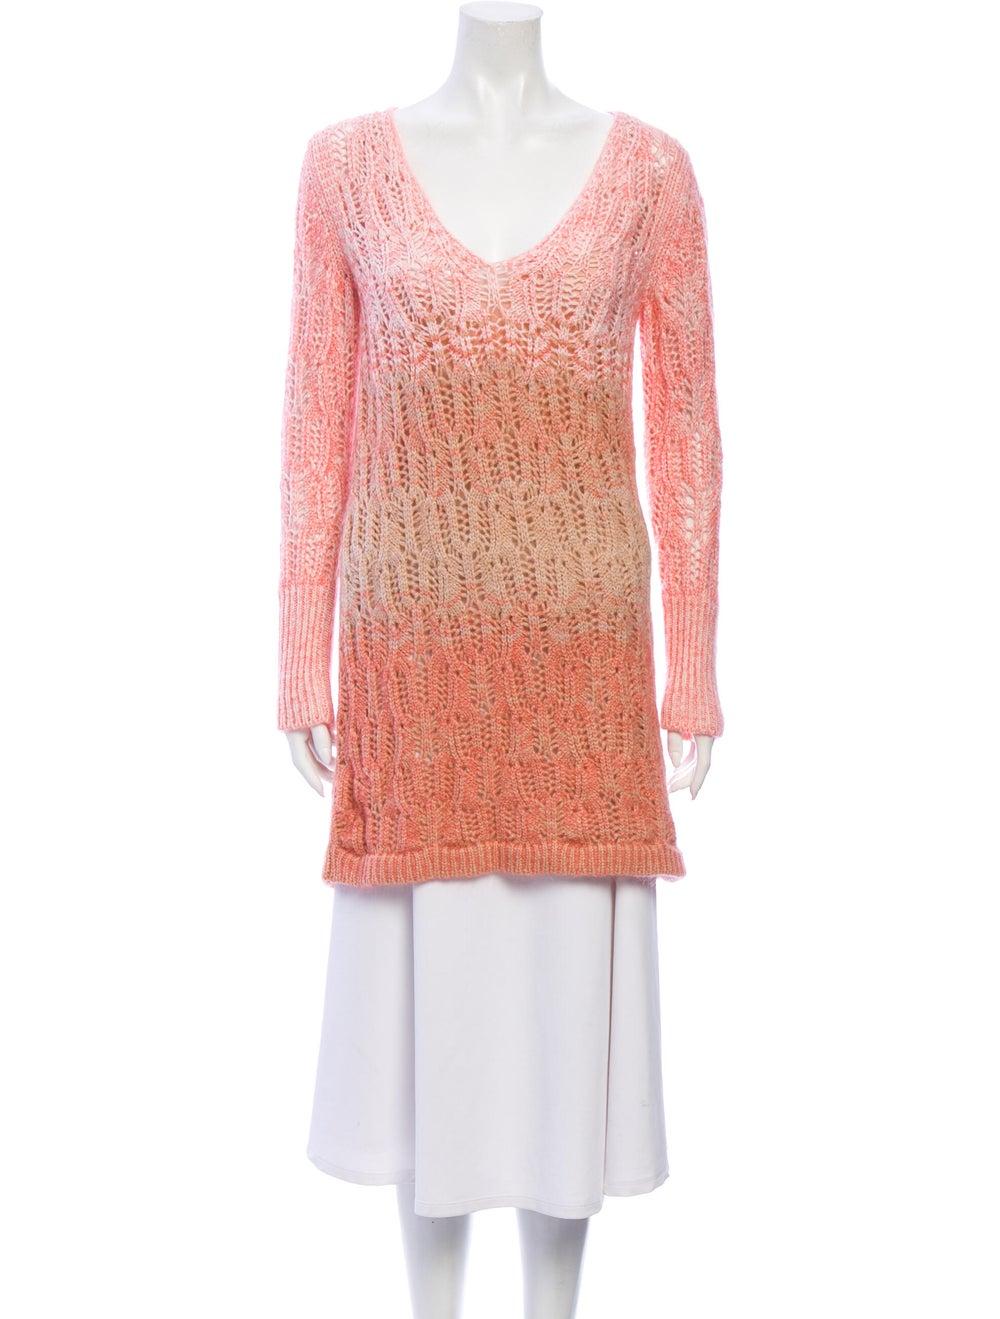 Missoni Cashmere Tie-Dye Print Sweater Pink - image 1